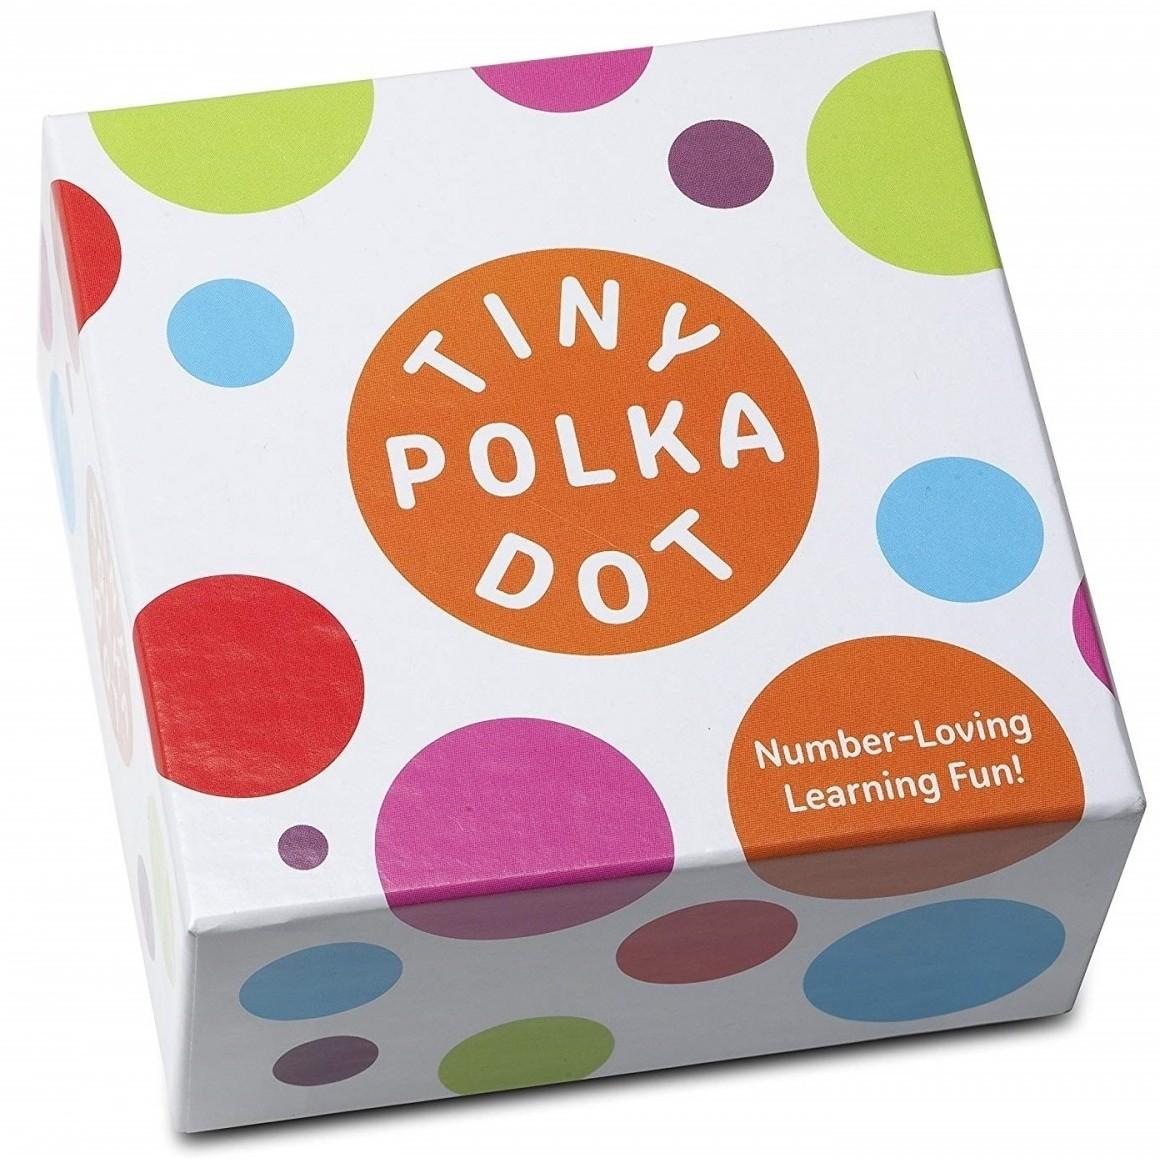 Tiny Polka Dot: Number-Loving Fun!